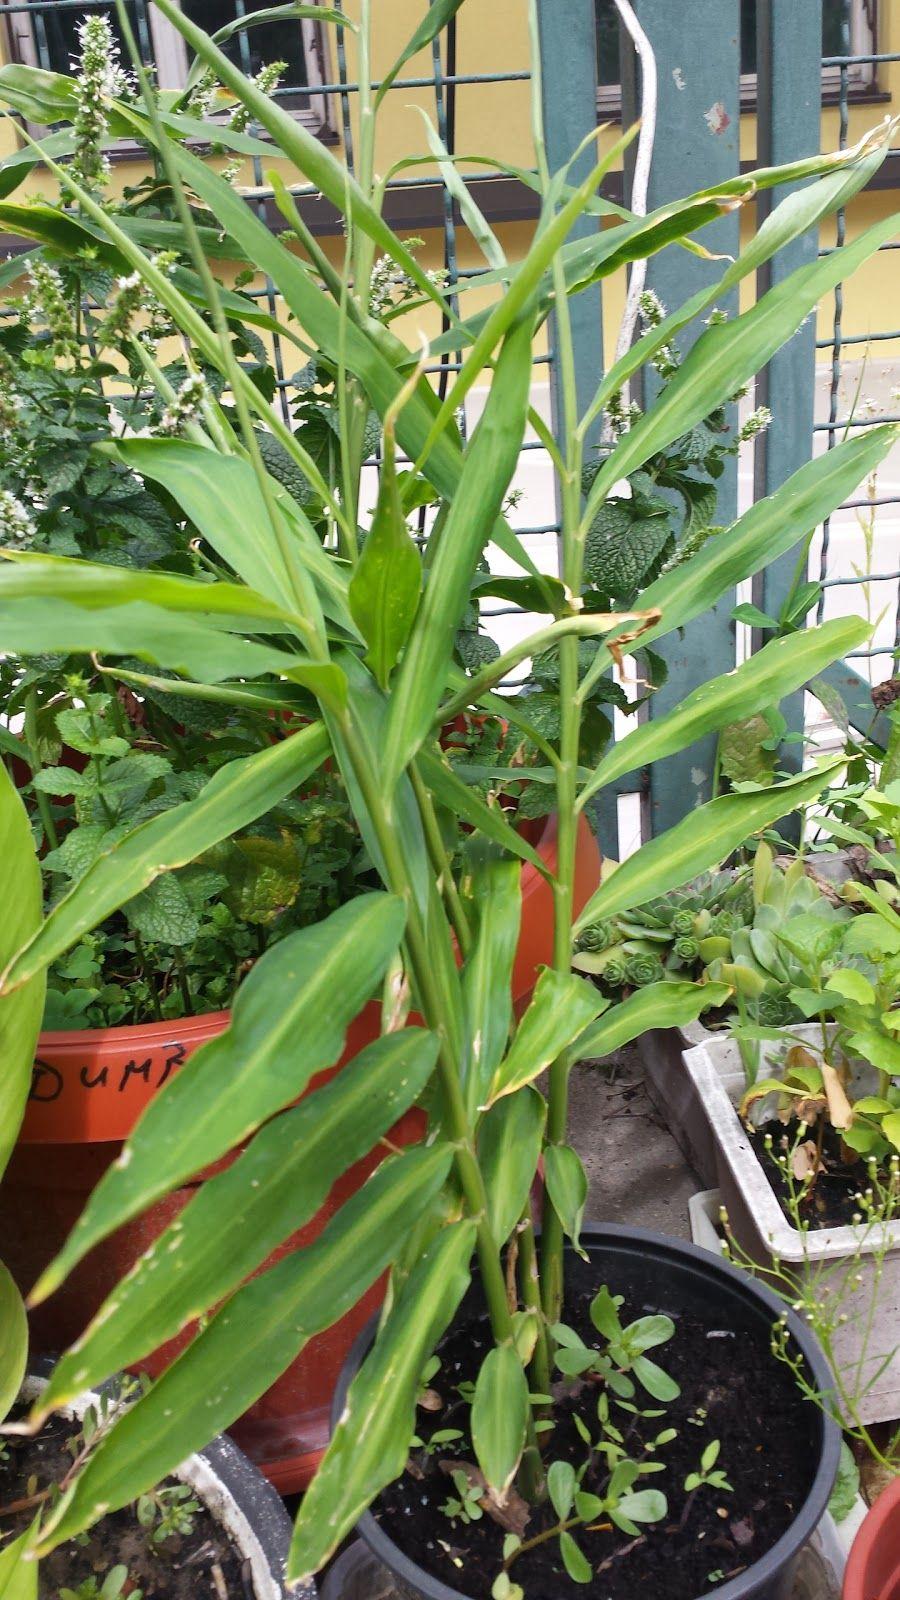 Đumbir u posudi Đumbir (Zingiber officinale), biljka je tropskih dijelova  jugoistočne Azije i spada u porodicu ljiljana. Poz… | Vegetable garden,  Plants, Garden